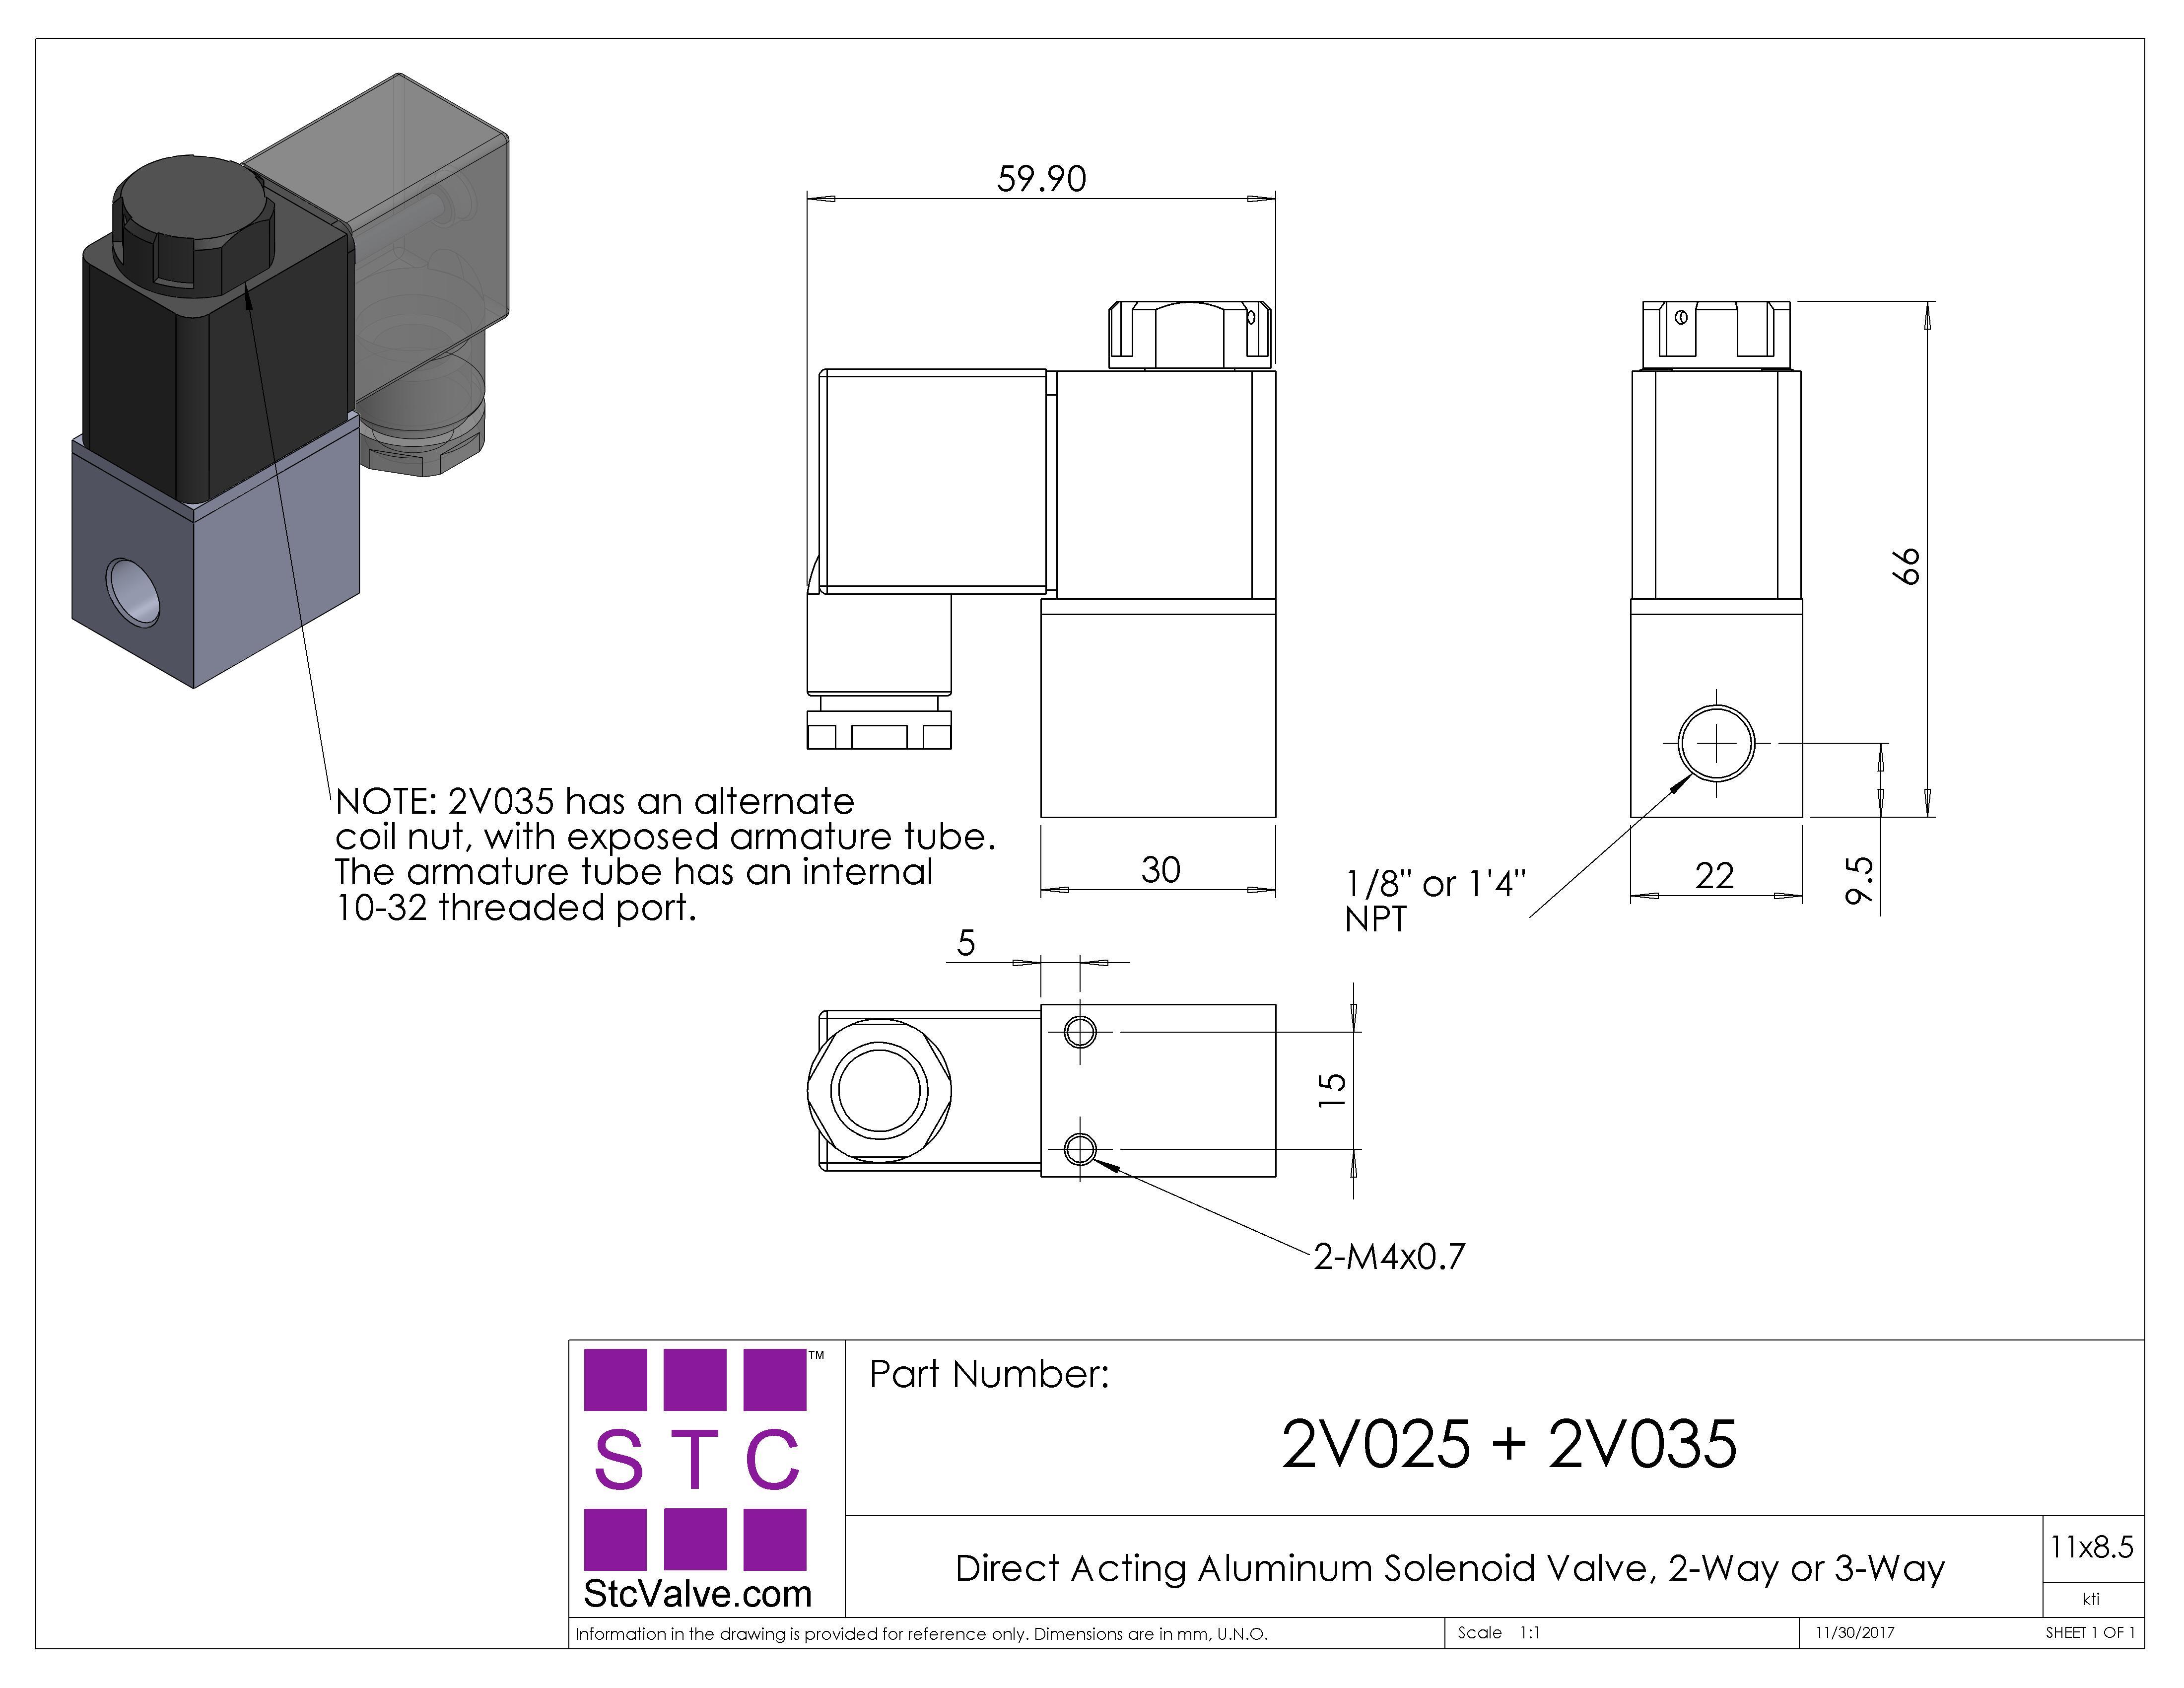 12v Air Solenoid Valve Wiring Diagram Find 12 Volt Starter 2v025 035 2 3 Way Position Direct Acting Aluminum Rh Stcvalve Com Ford Lawn Mower